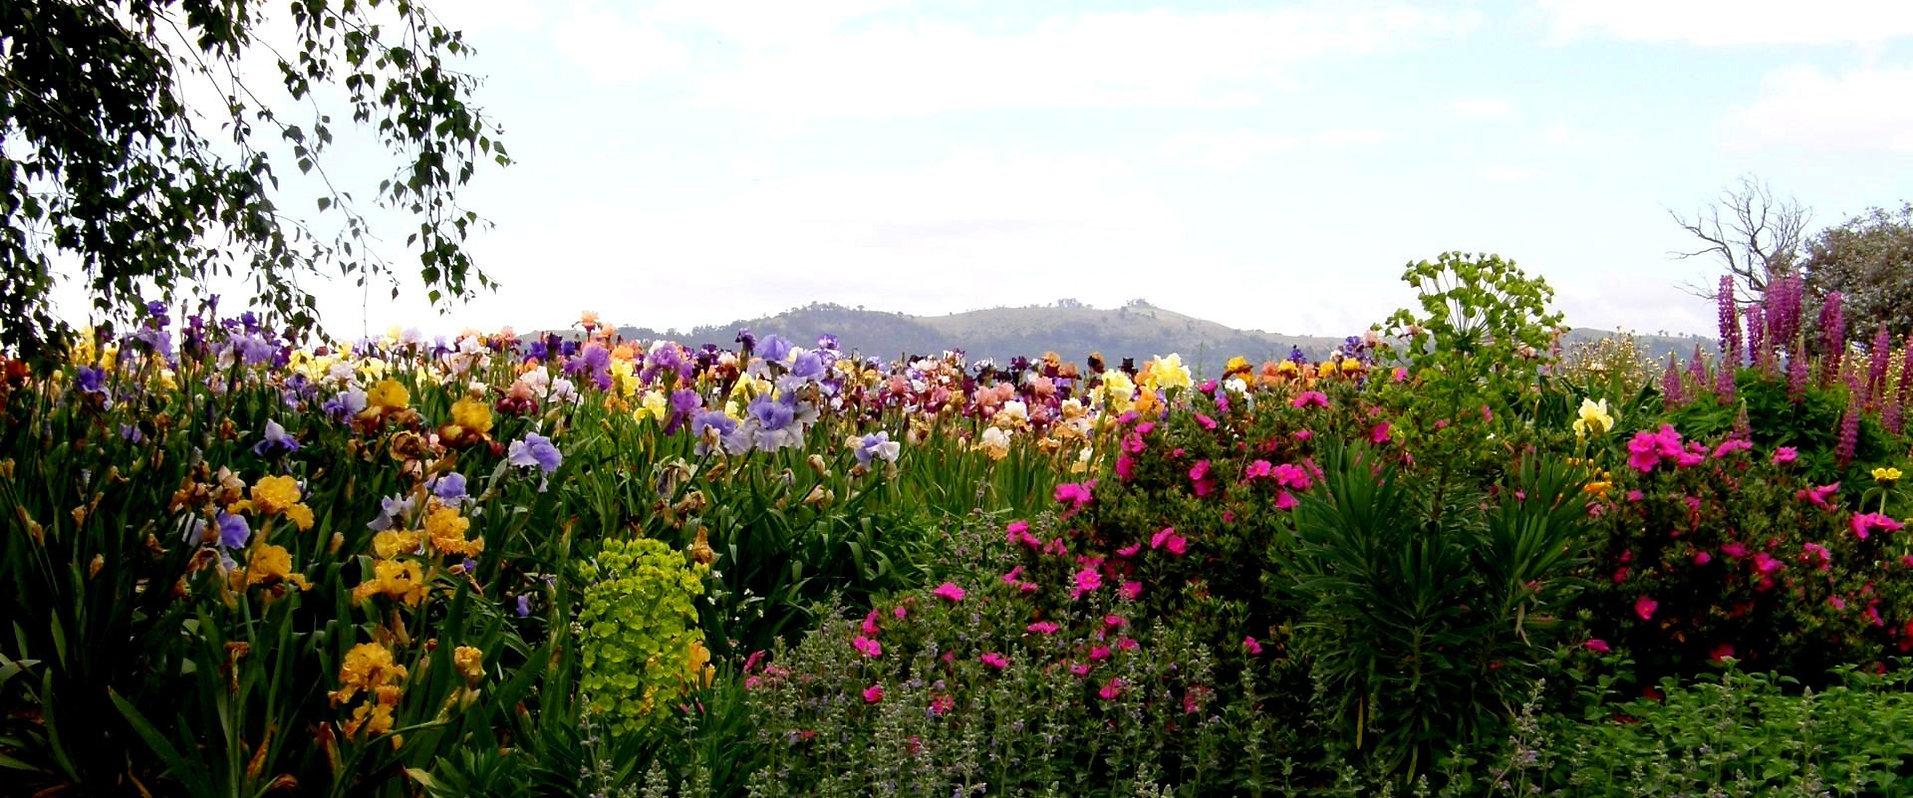 Tijara Iris Garden Best Photo.JPG